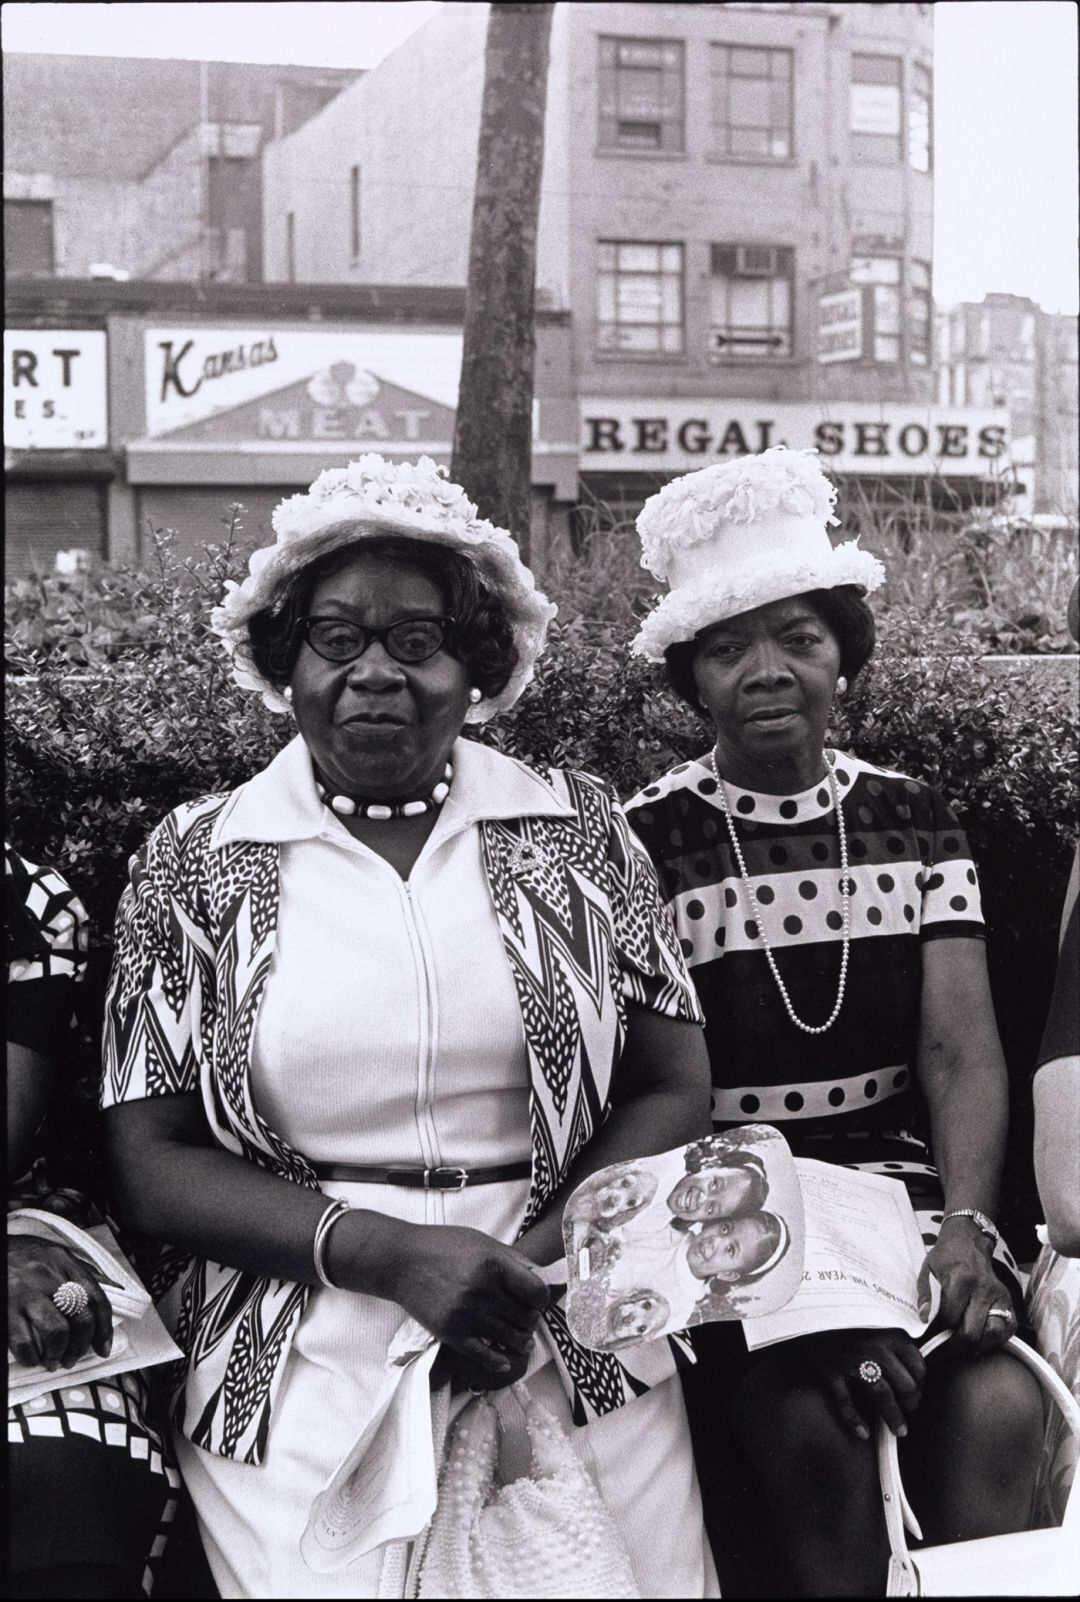 Ming Smith : Amen Corner Sisters (detail), New York City, NY, 1976.